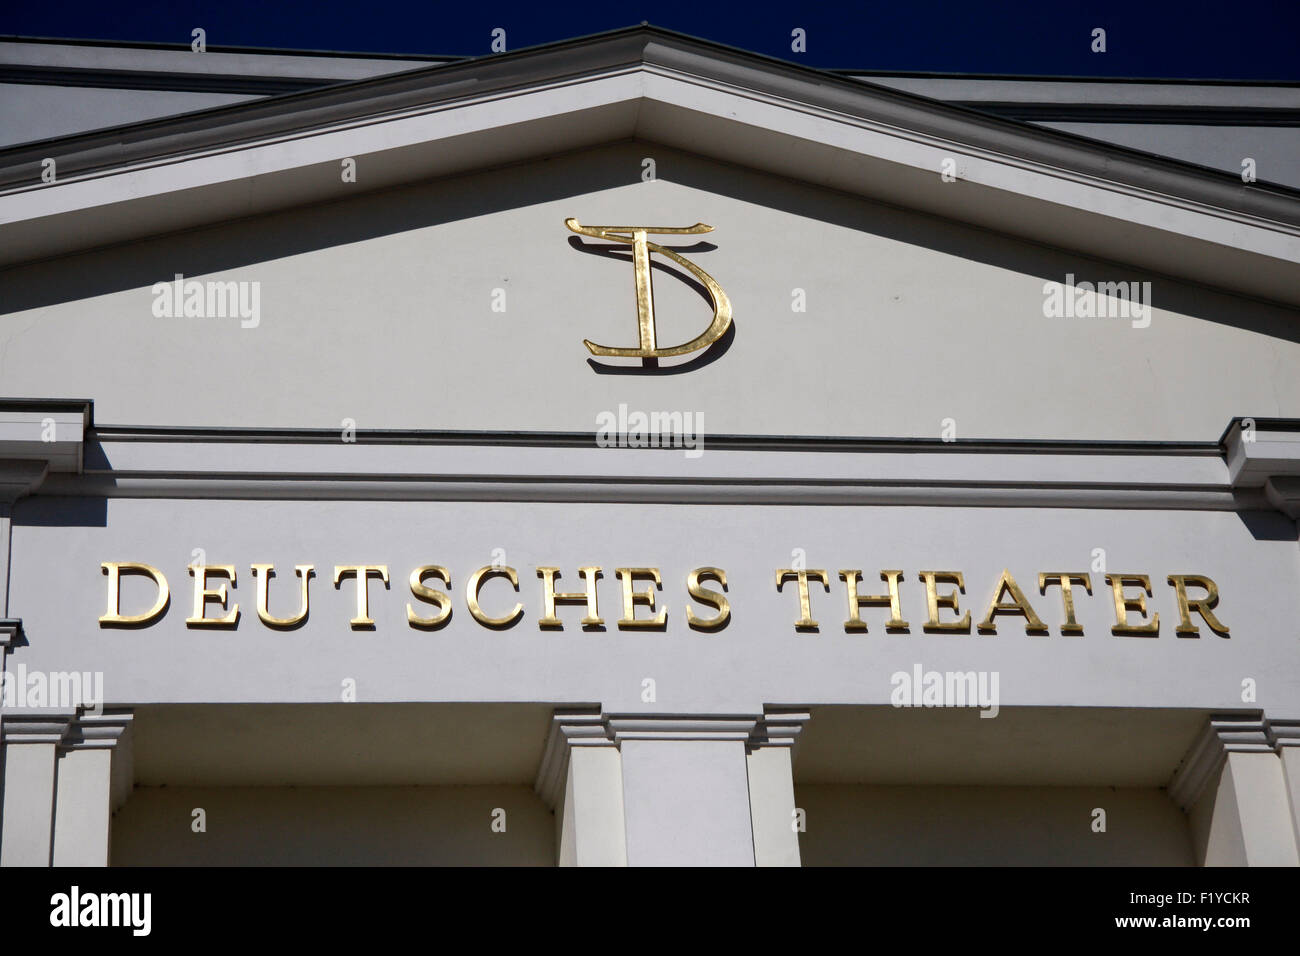 Deutsches Theater, Berlin-Mitte. - Stock Image